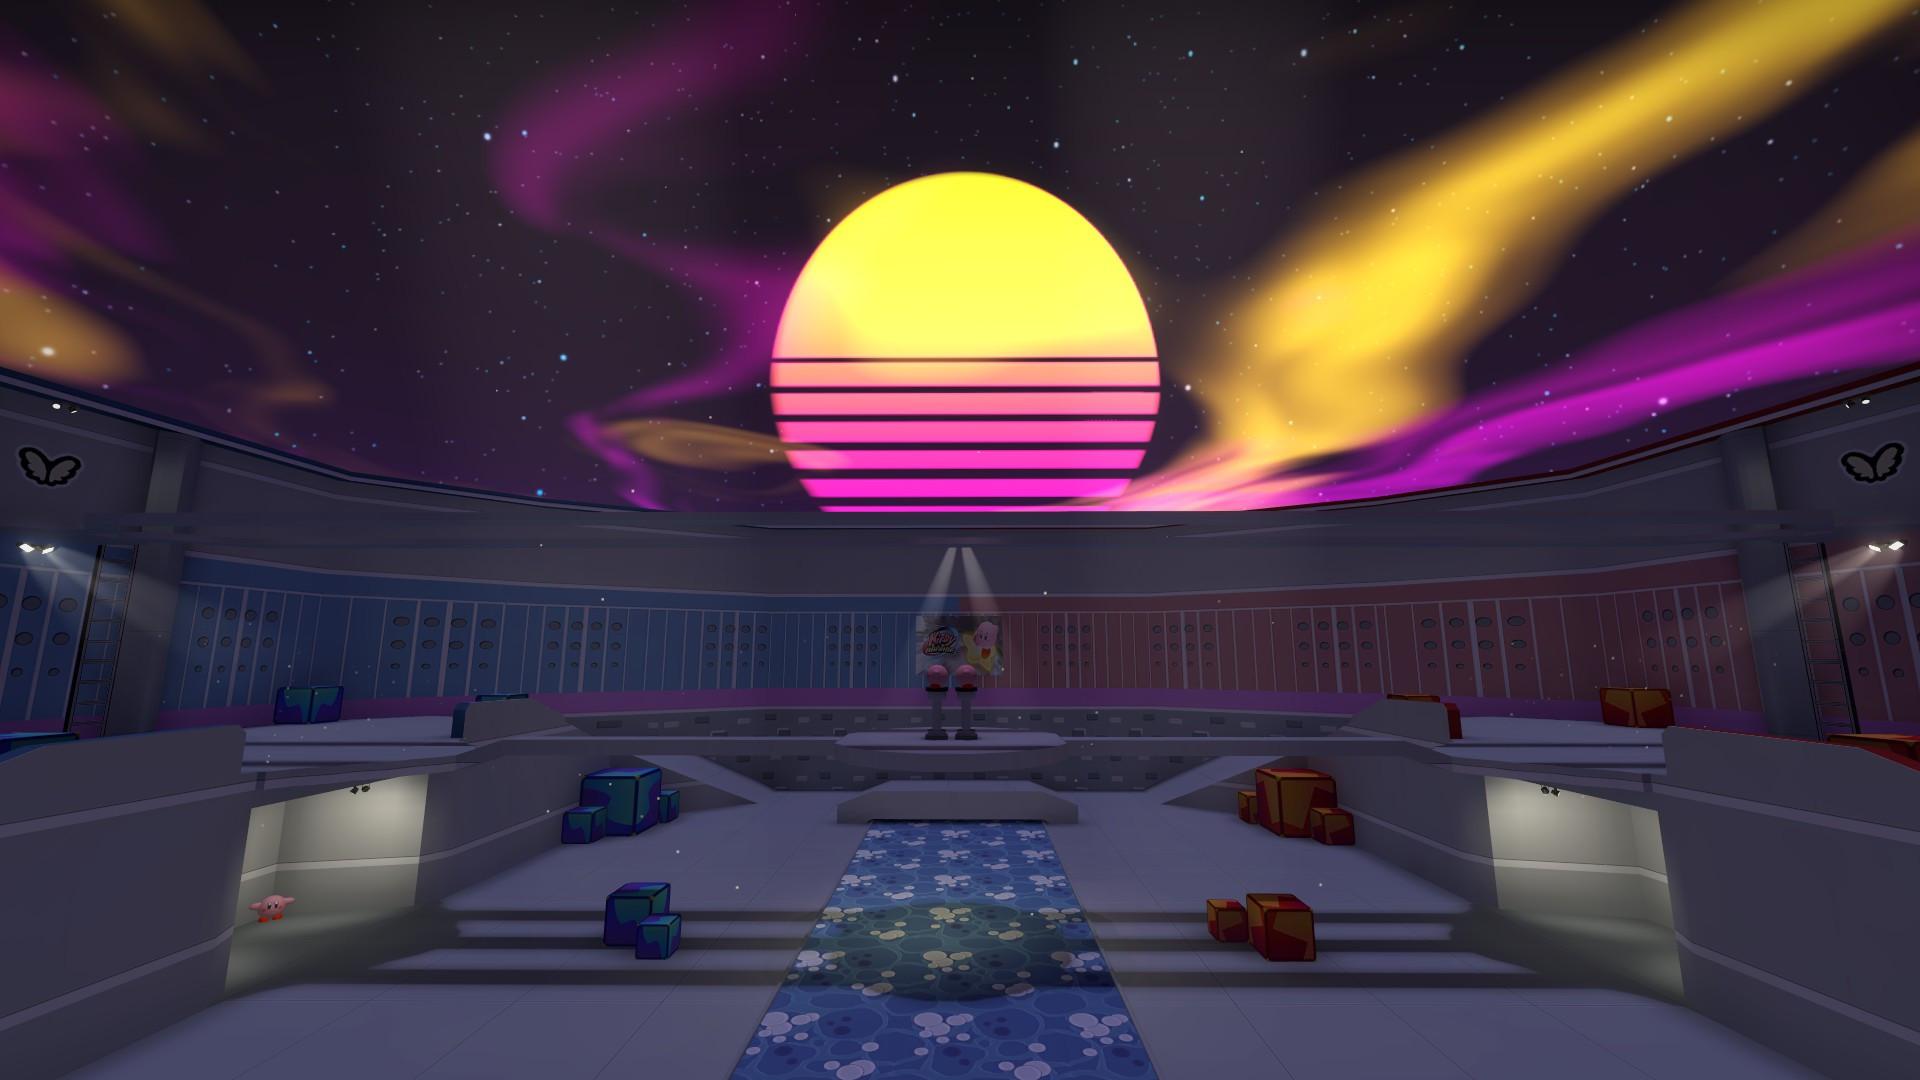 ka kirby dome night 1